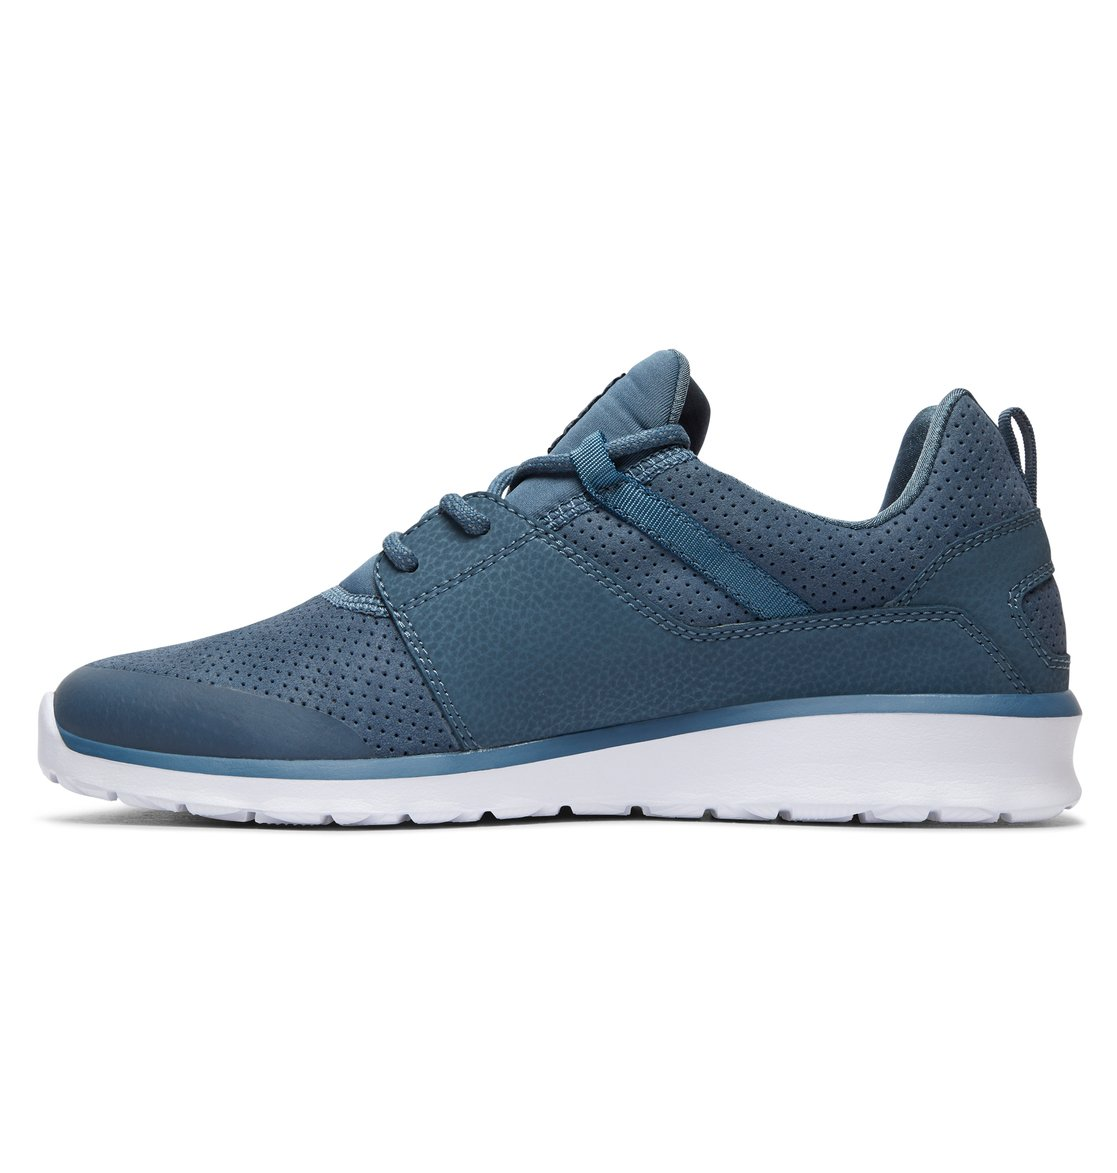 Heathrow Prestige - Baskets - Bleu - DC Shoes ZMfnXEsJX